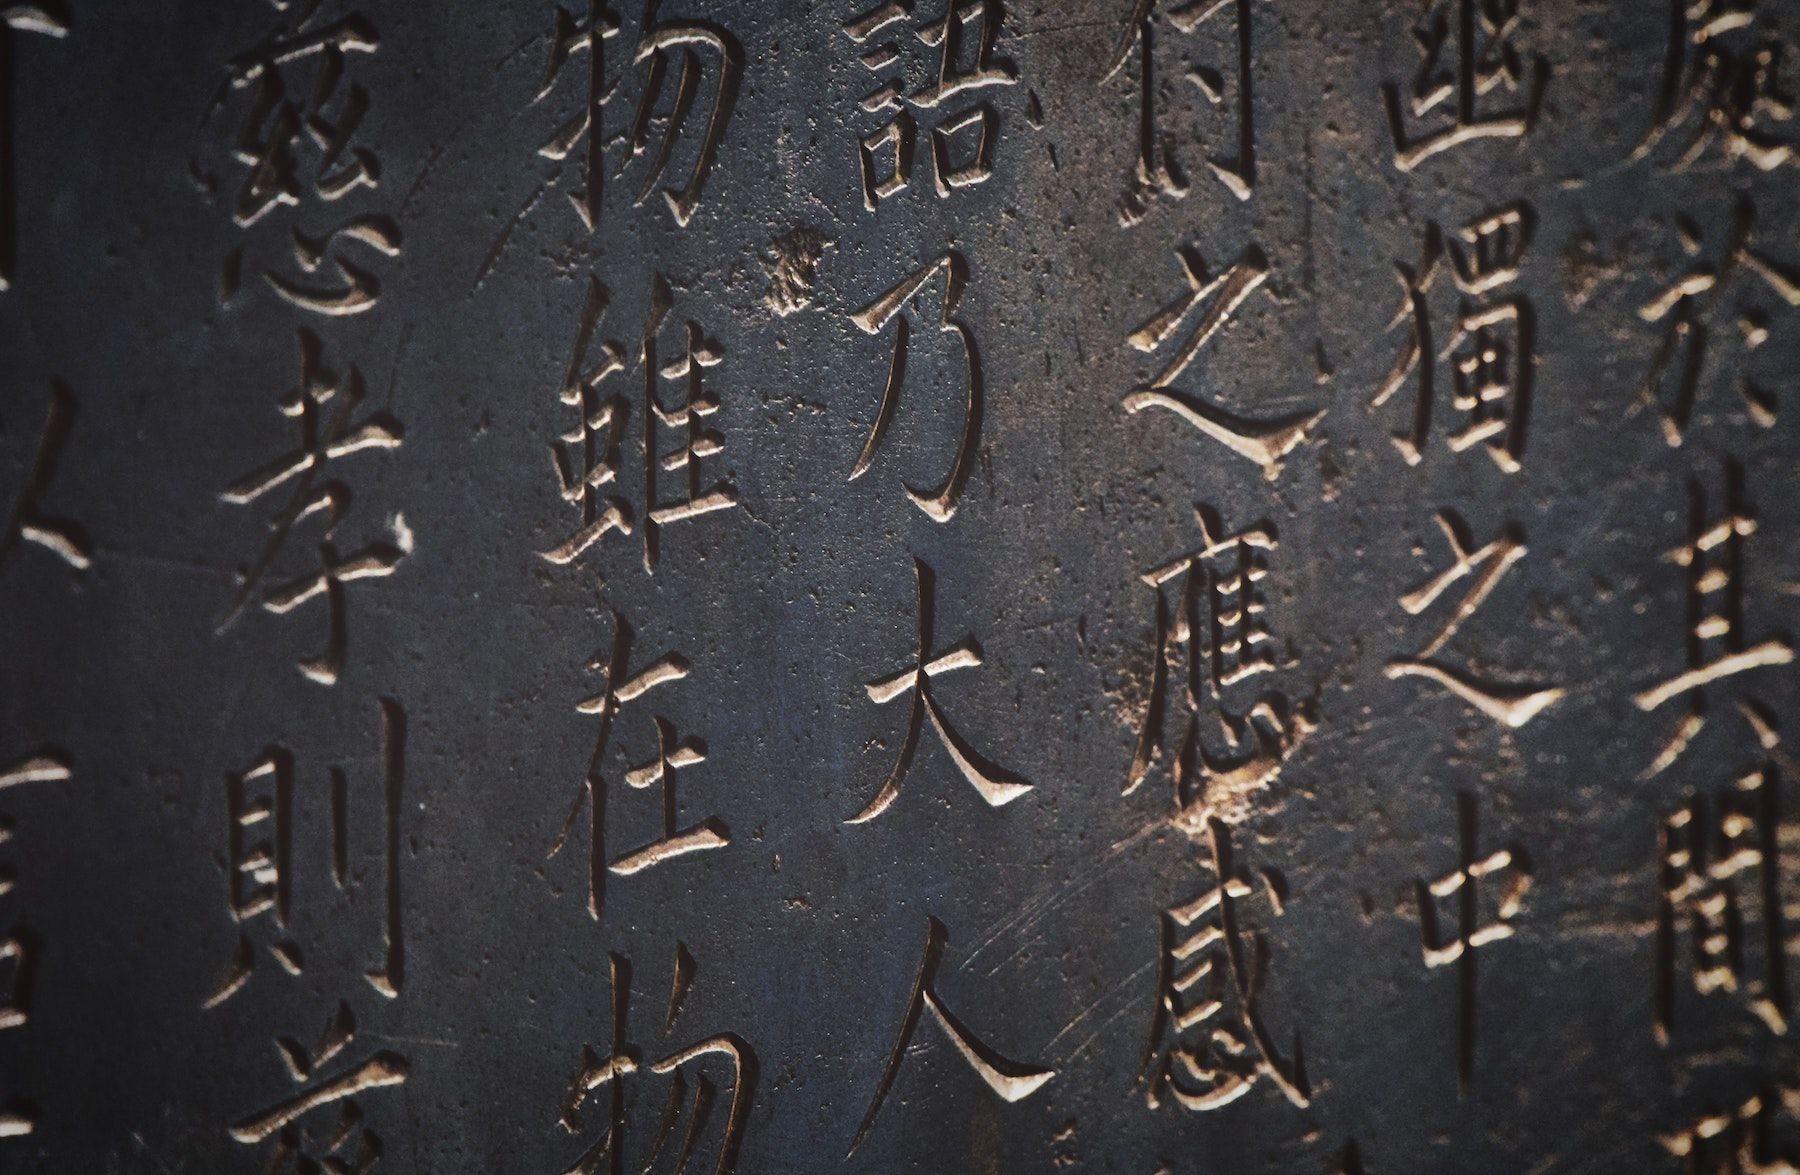 Comparing Mandarin to Cantonese